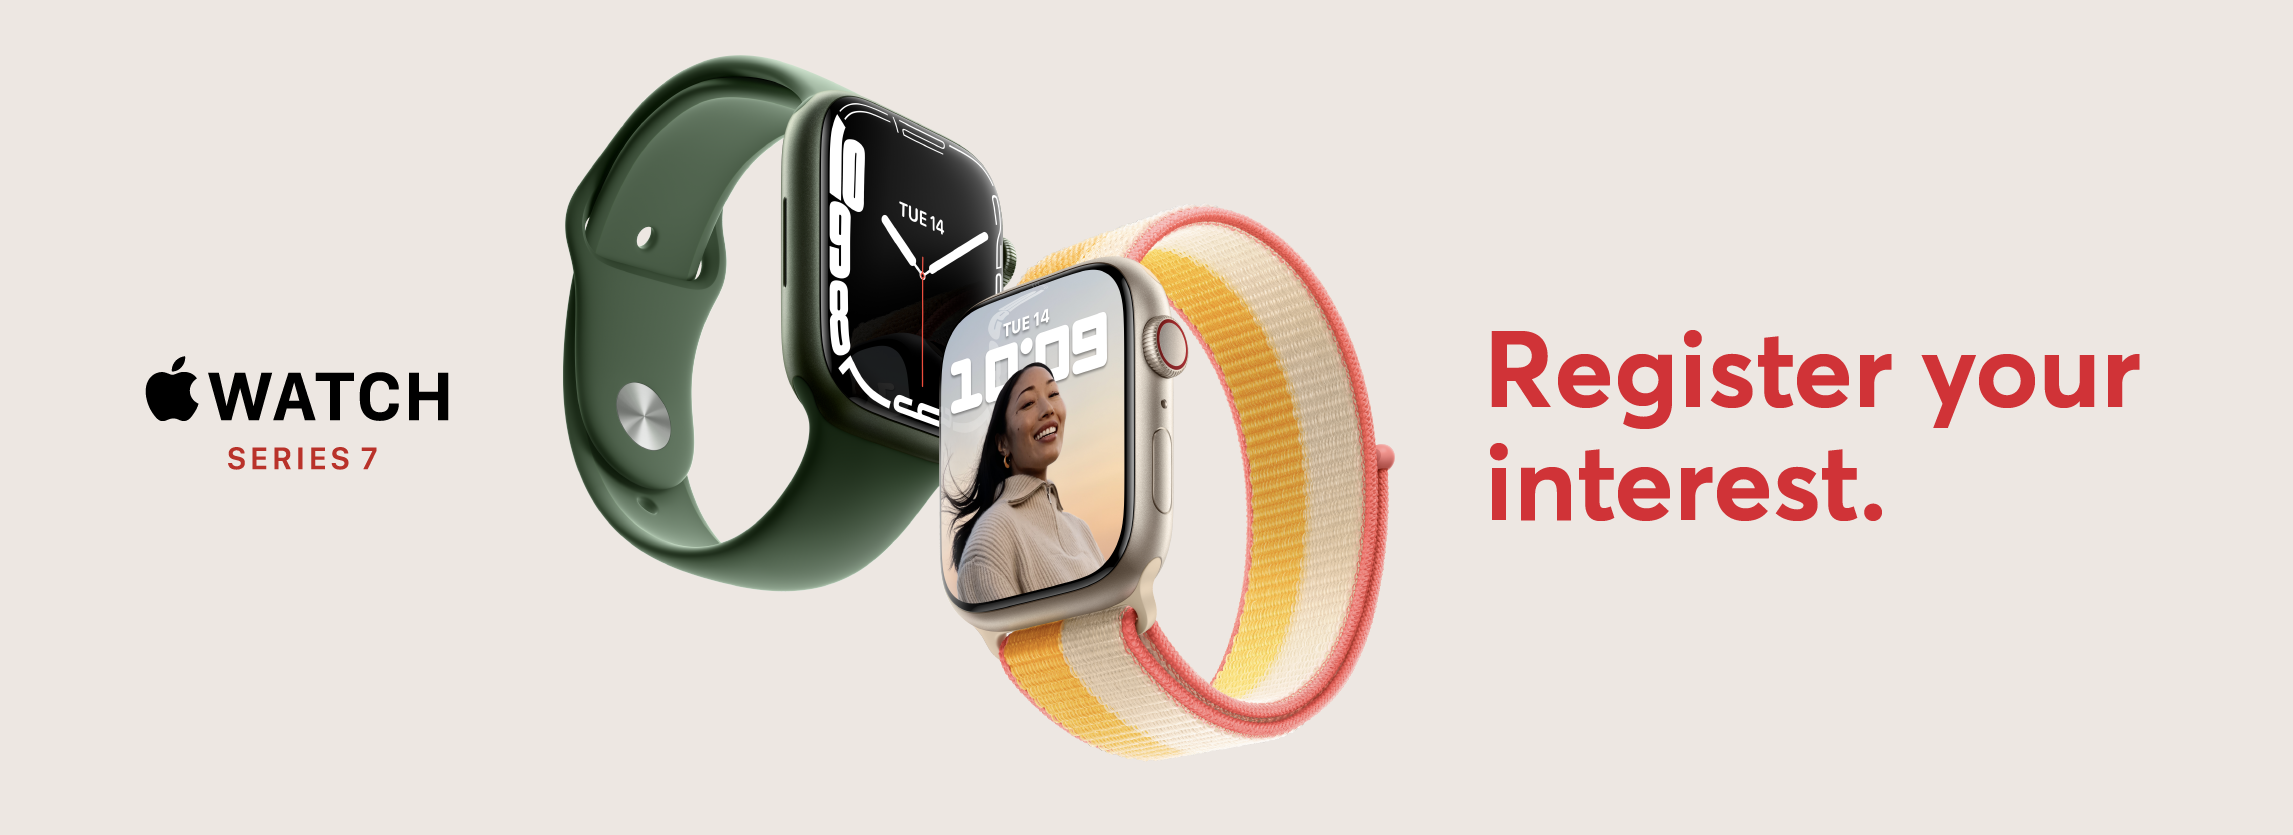 2021.10.07_Apple Watch_1100x400